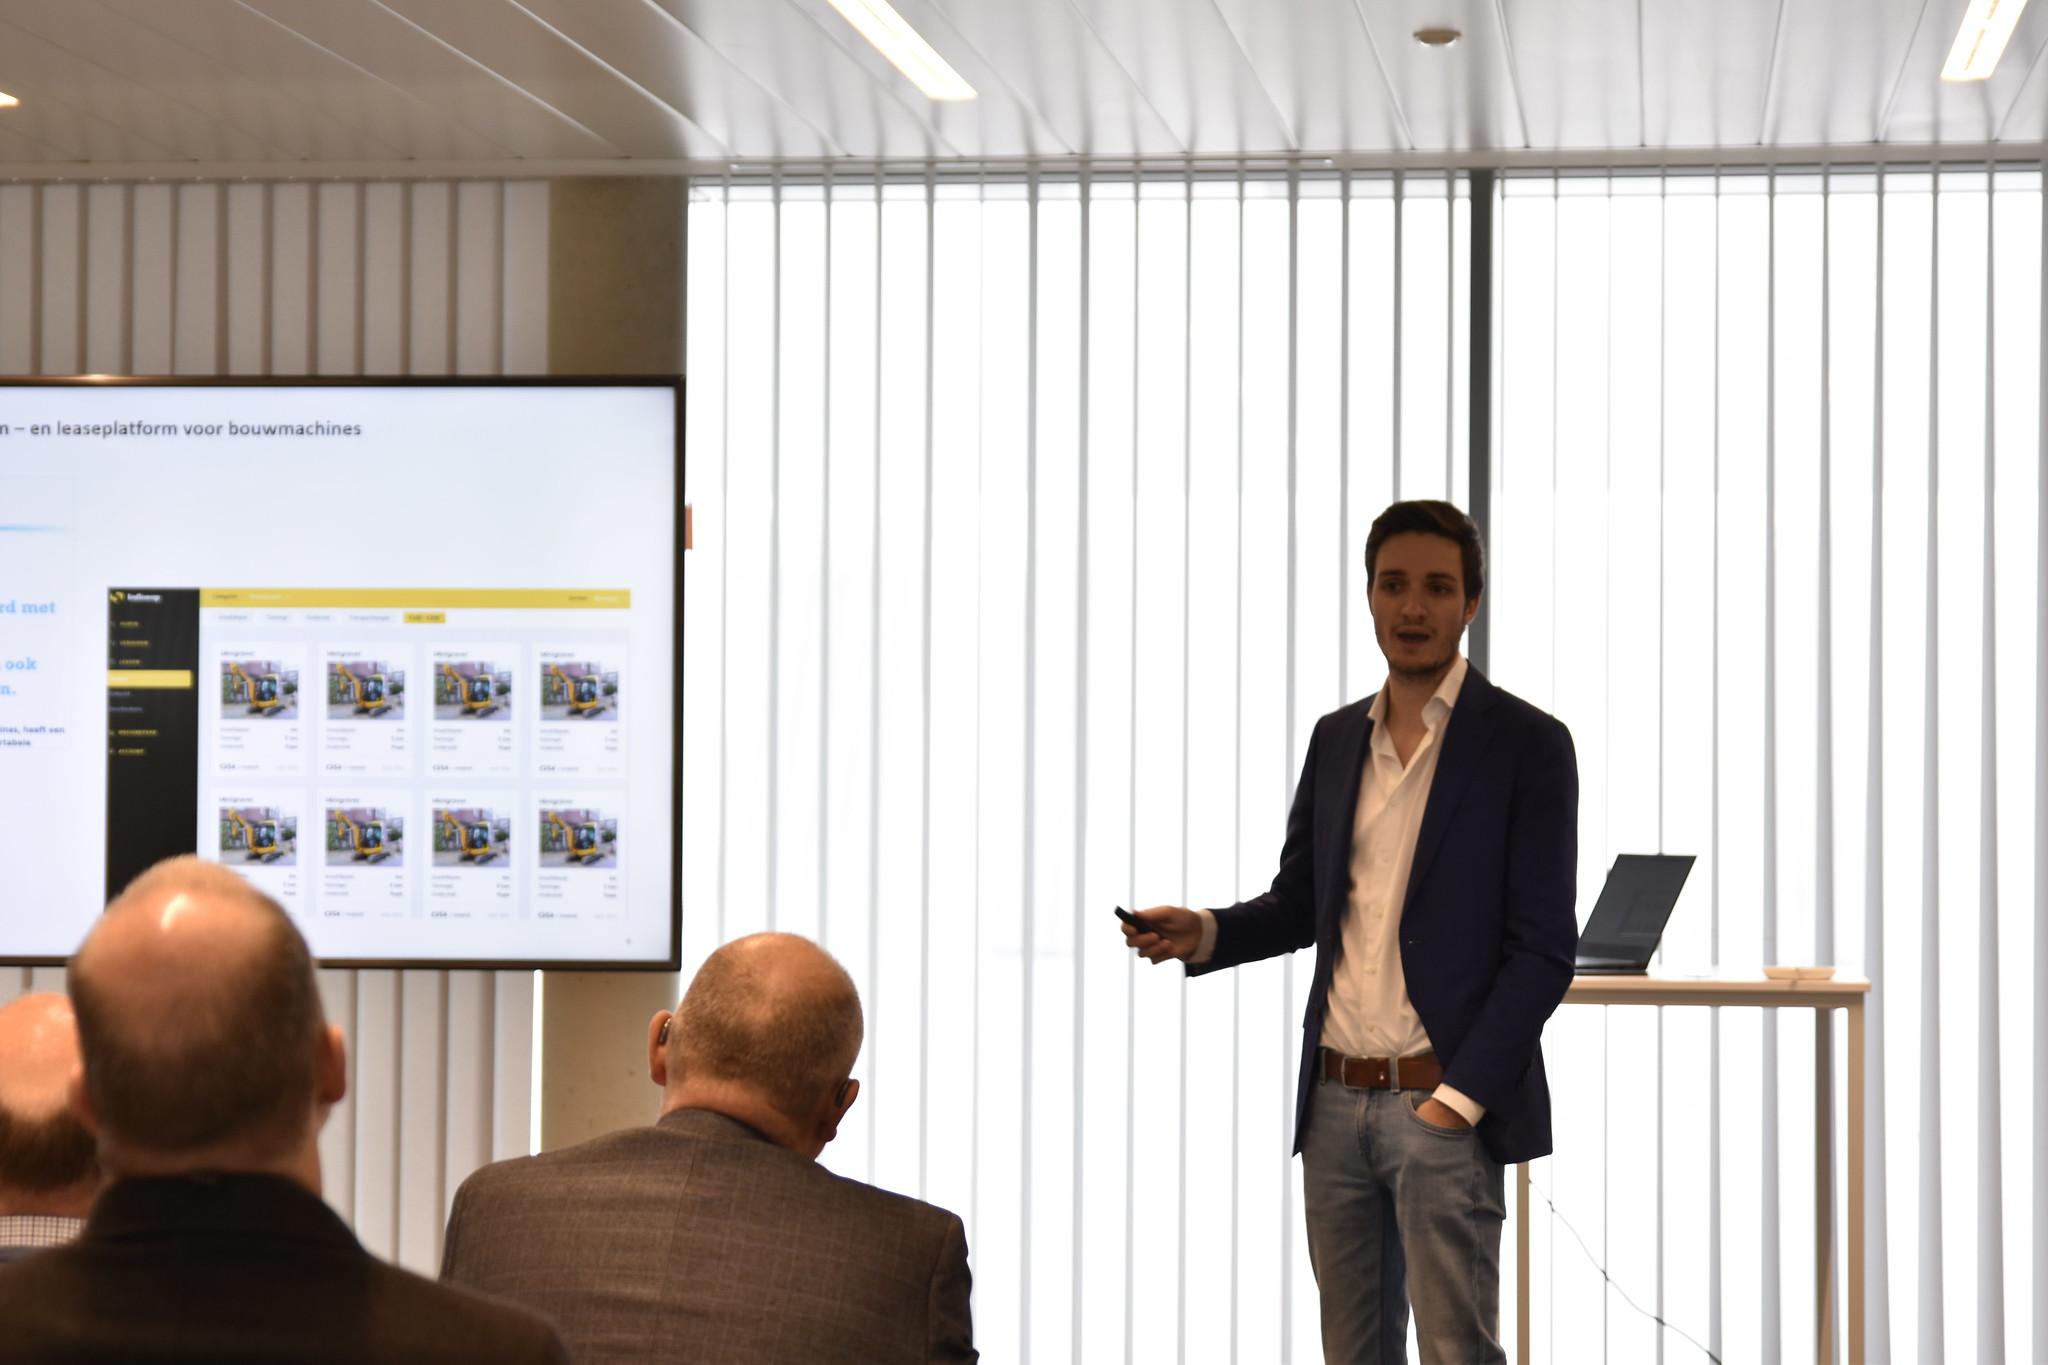 20191114 - Limburg Startup - Stakeholders meeting